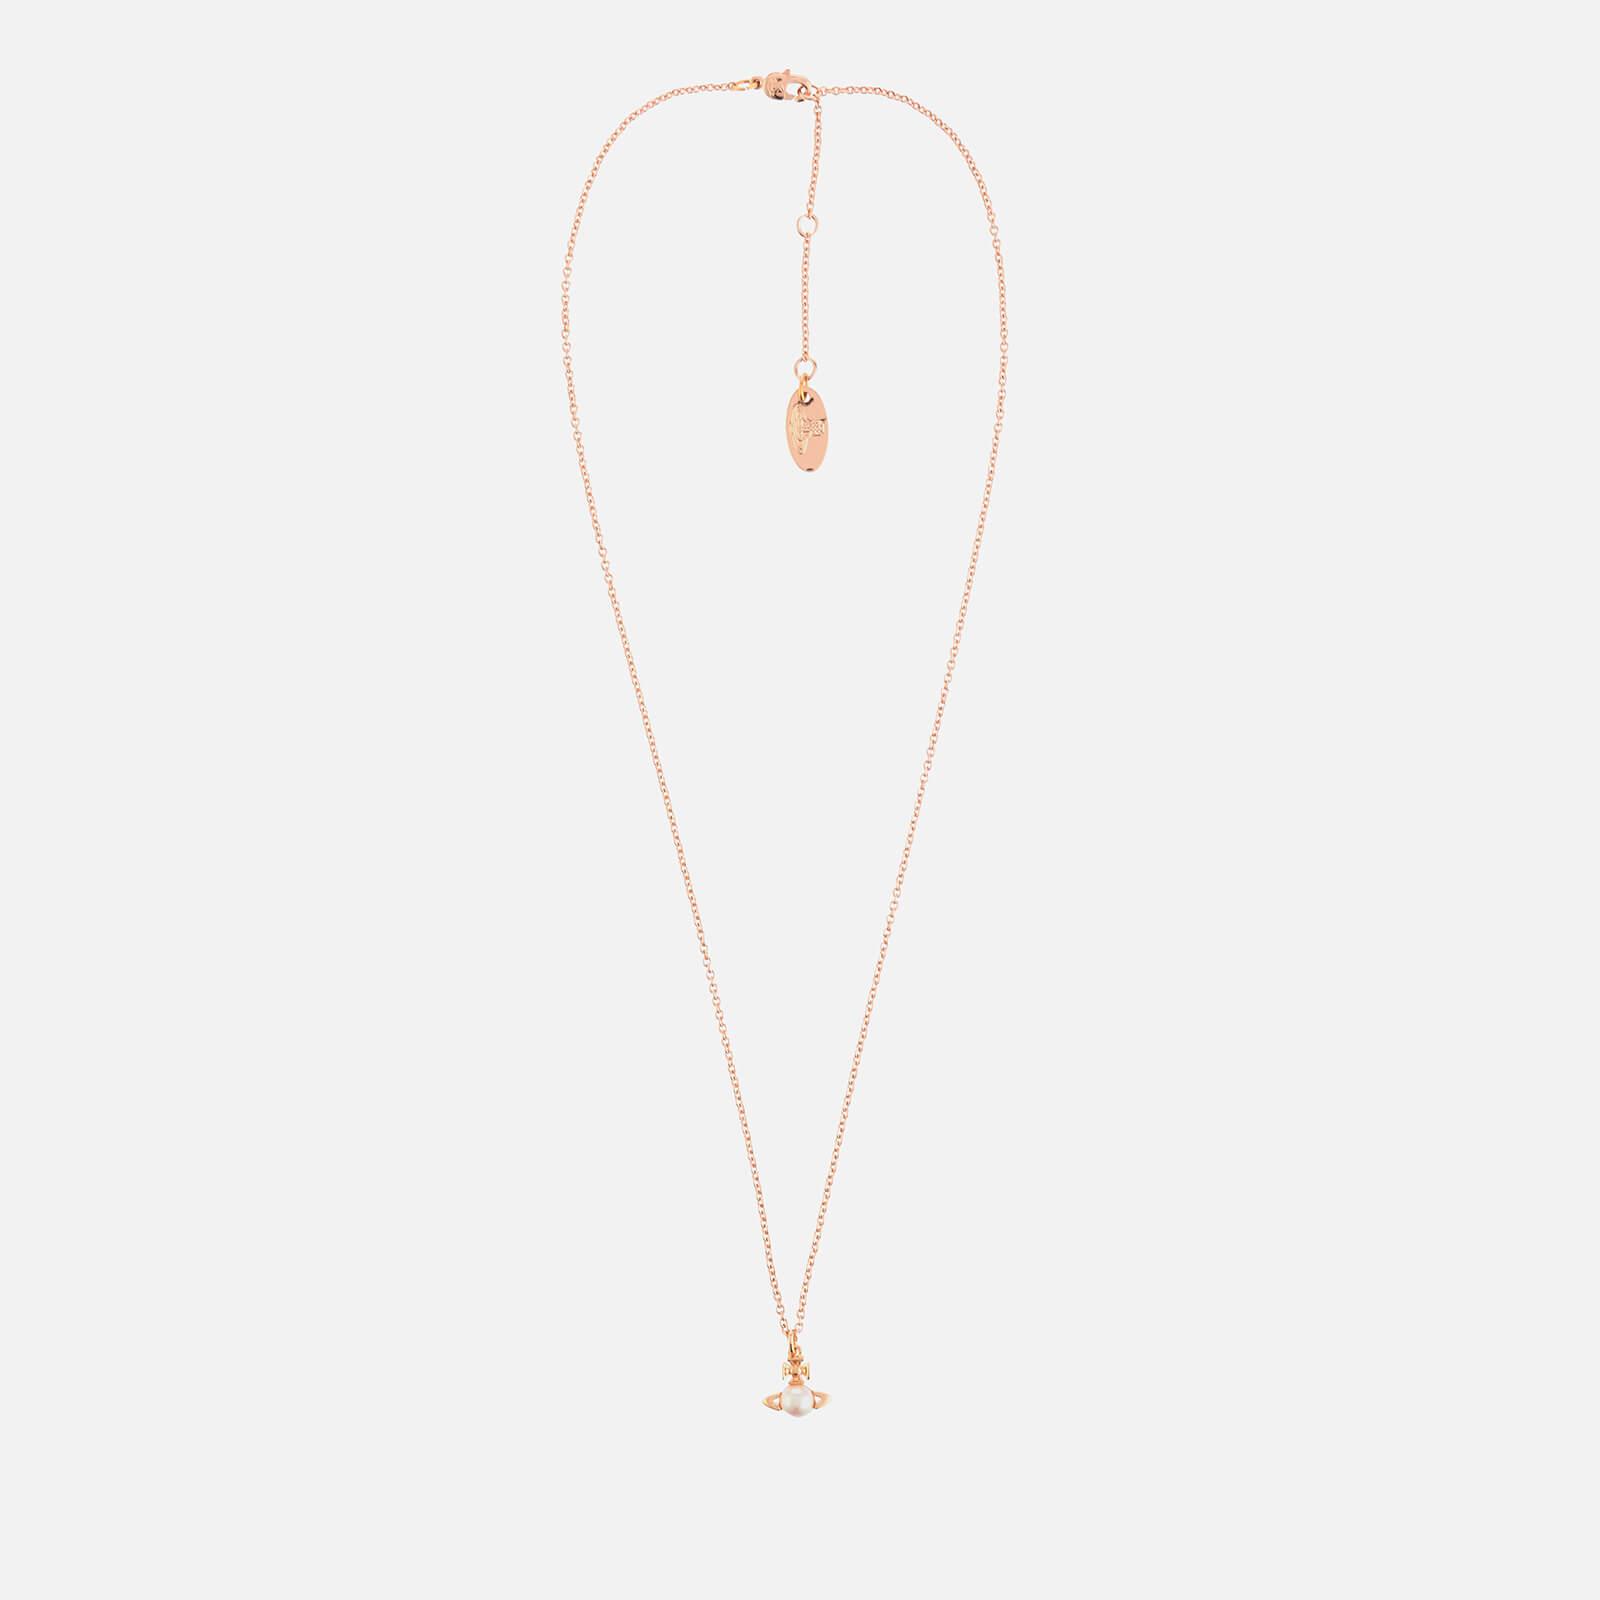 Vivienne Westwood Women's Balbina Pendant - Pink Gold Cream Pearl